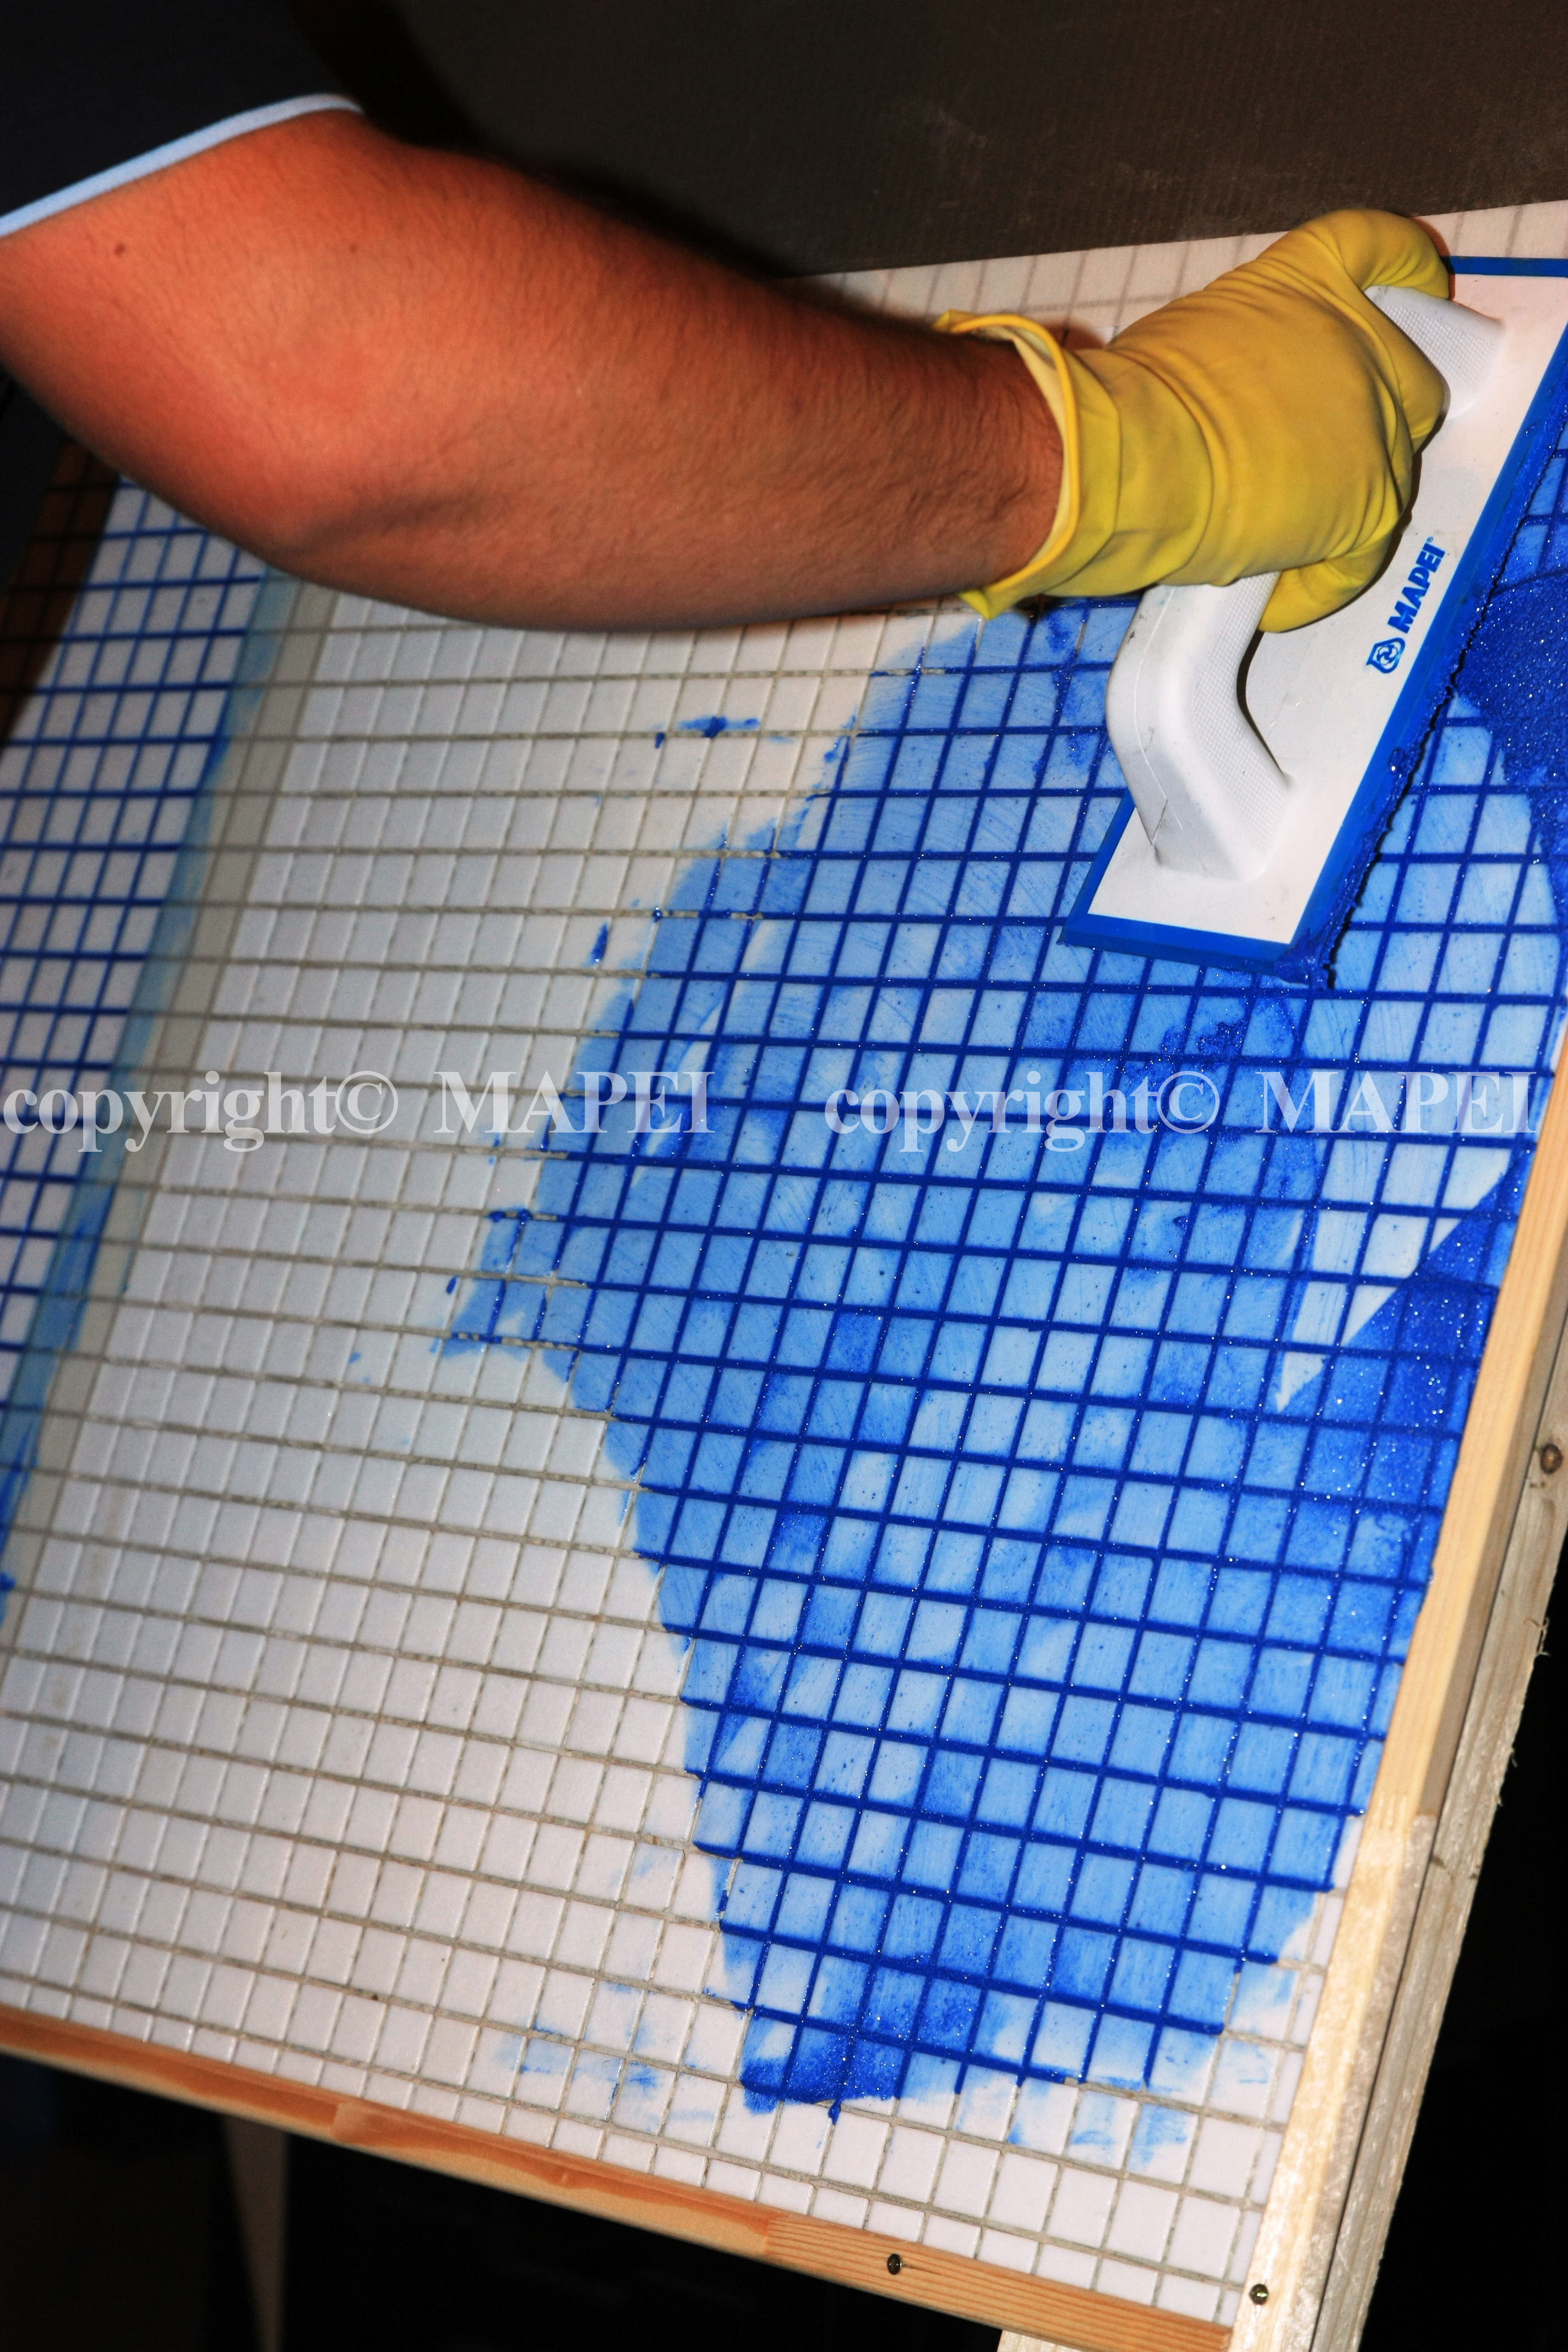 16. spatula rostuire mozaic din sticla MAPEI - Poza 16